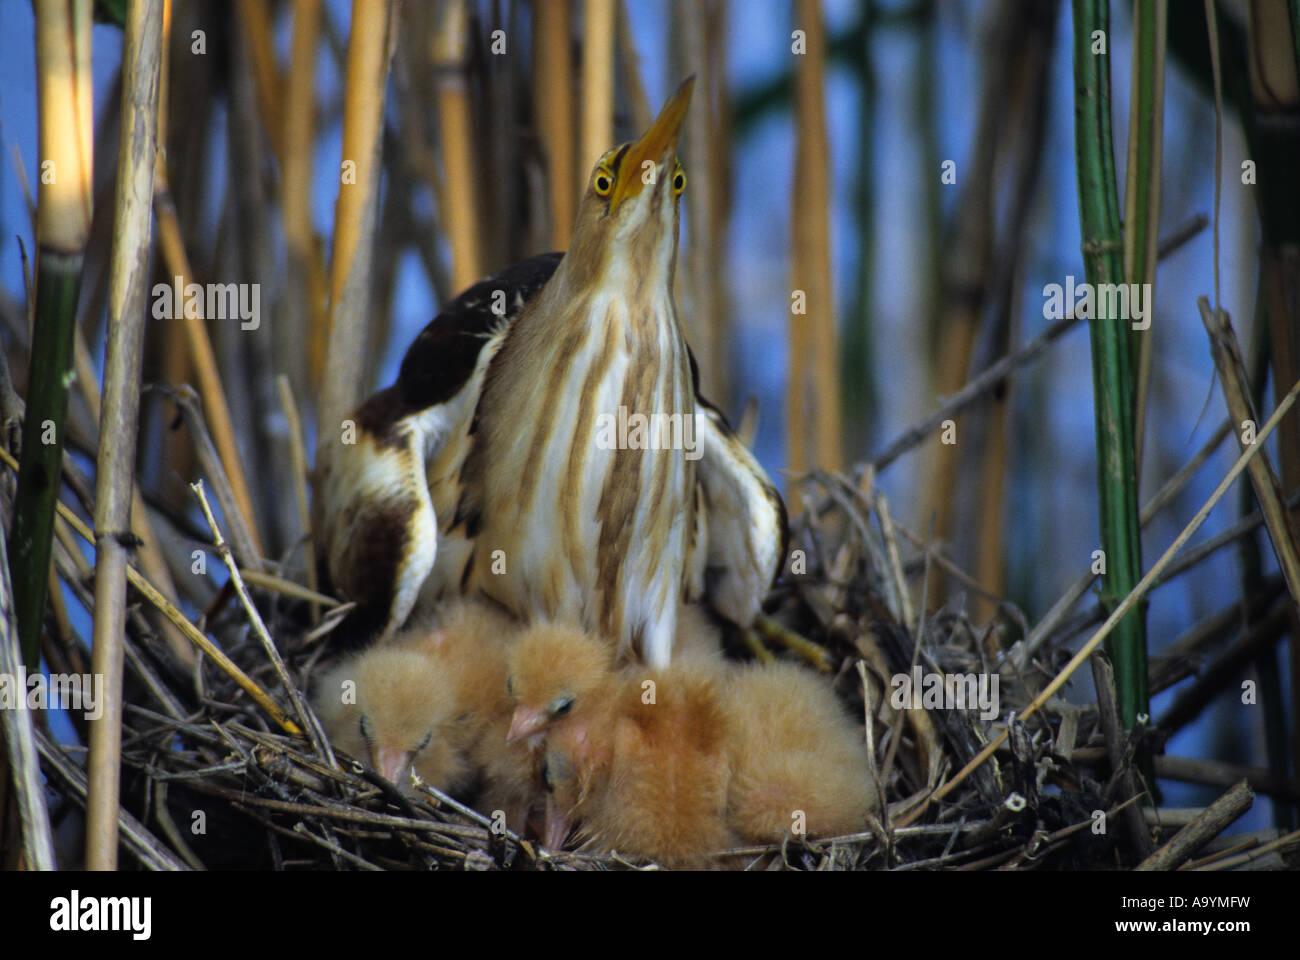 (Ixobrychus minutus) family Ardeidae, Hortobagy-lakes, Hungary Stock Photo